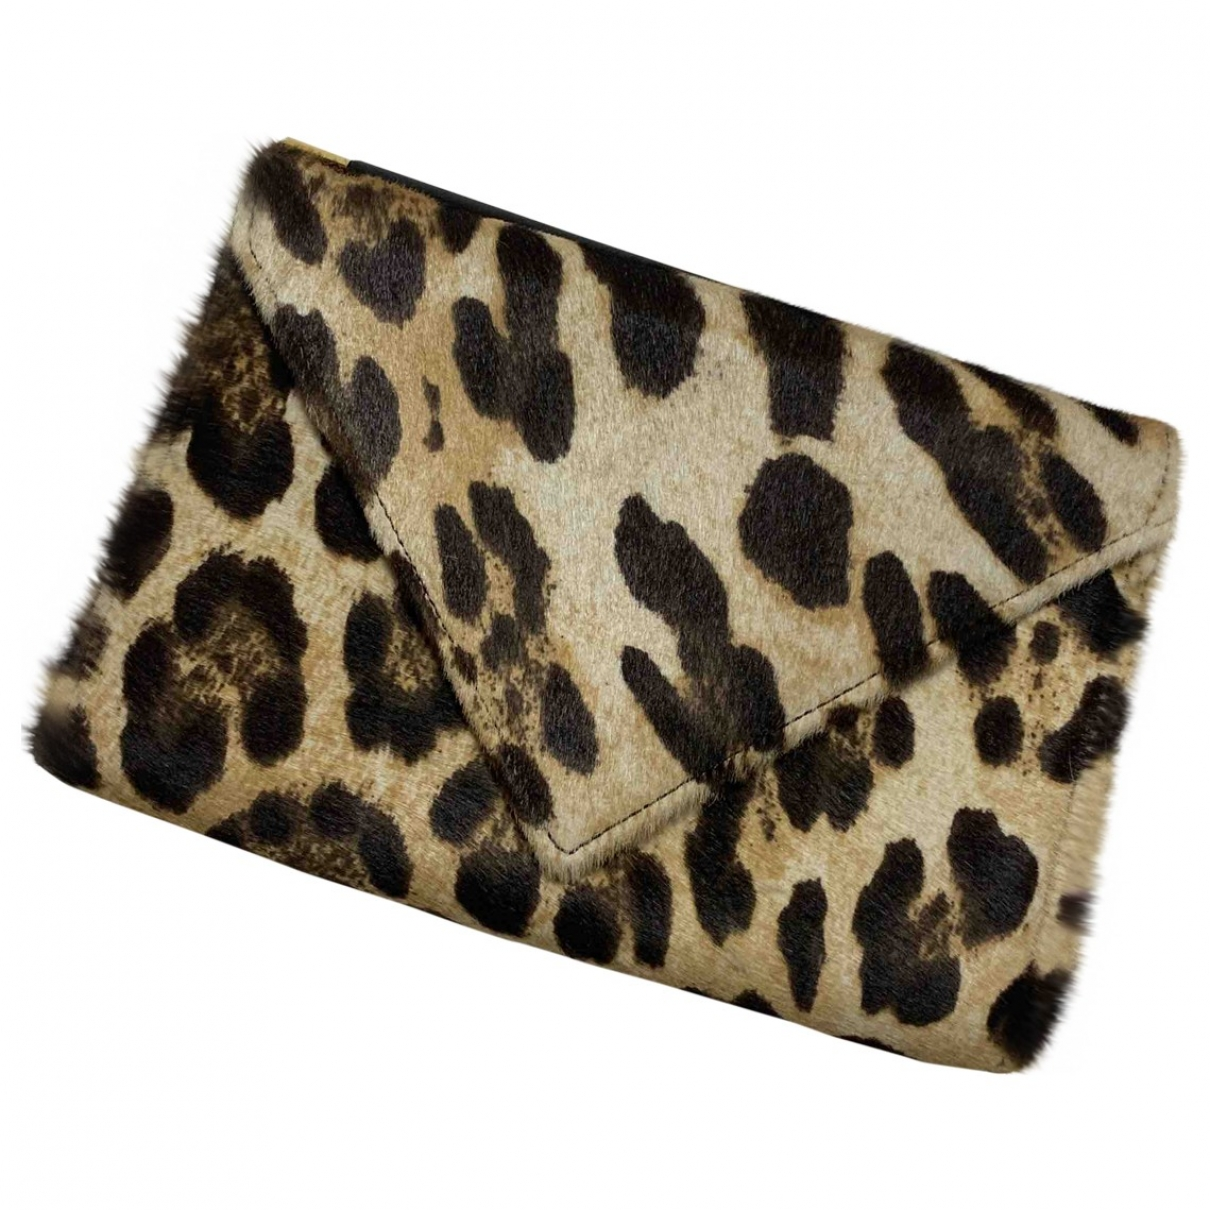 Giuseppe Zanotti \N Brown Pony-style calfskin Clutch bag for Women \N